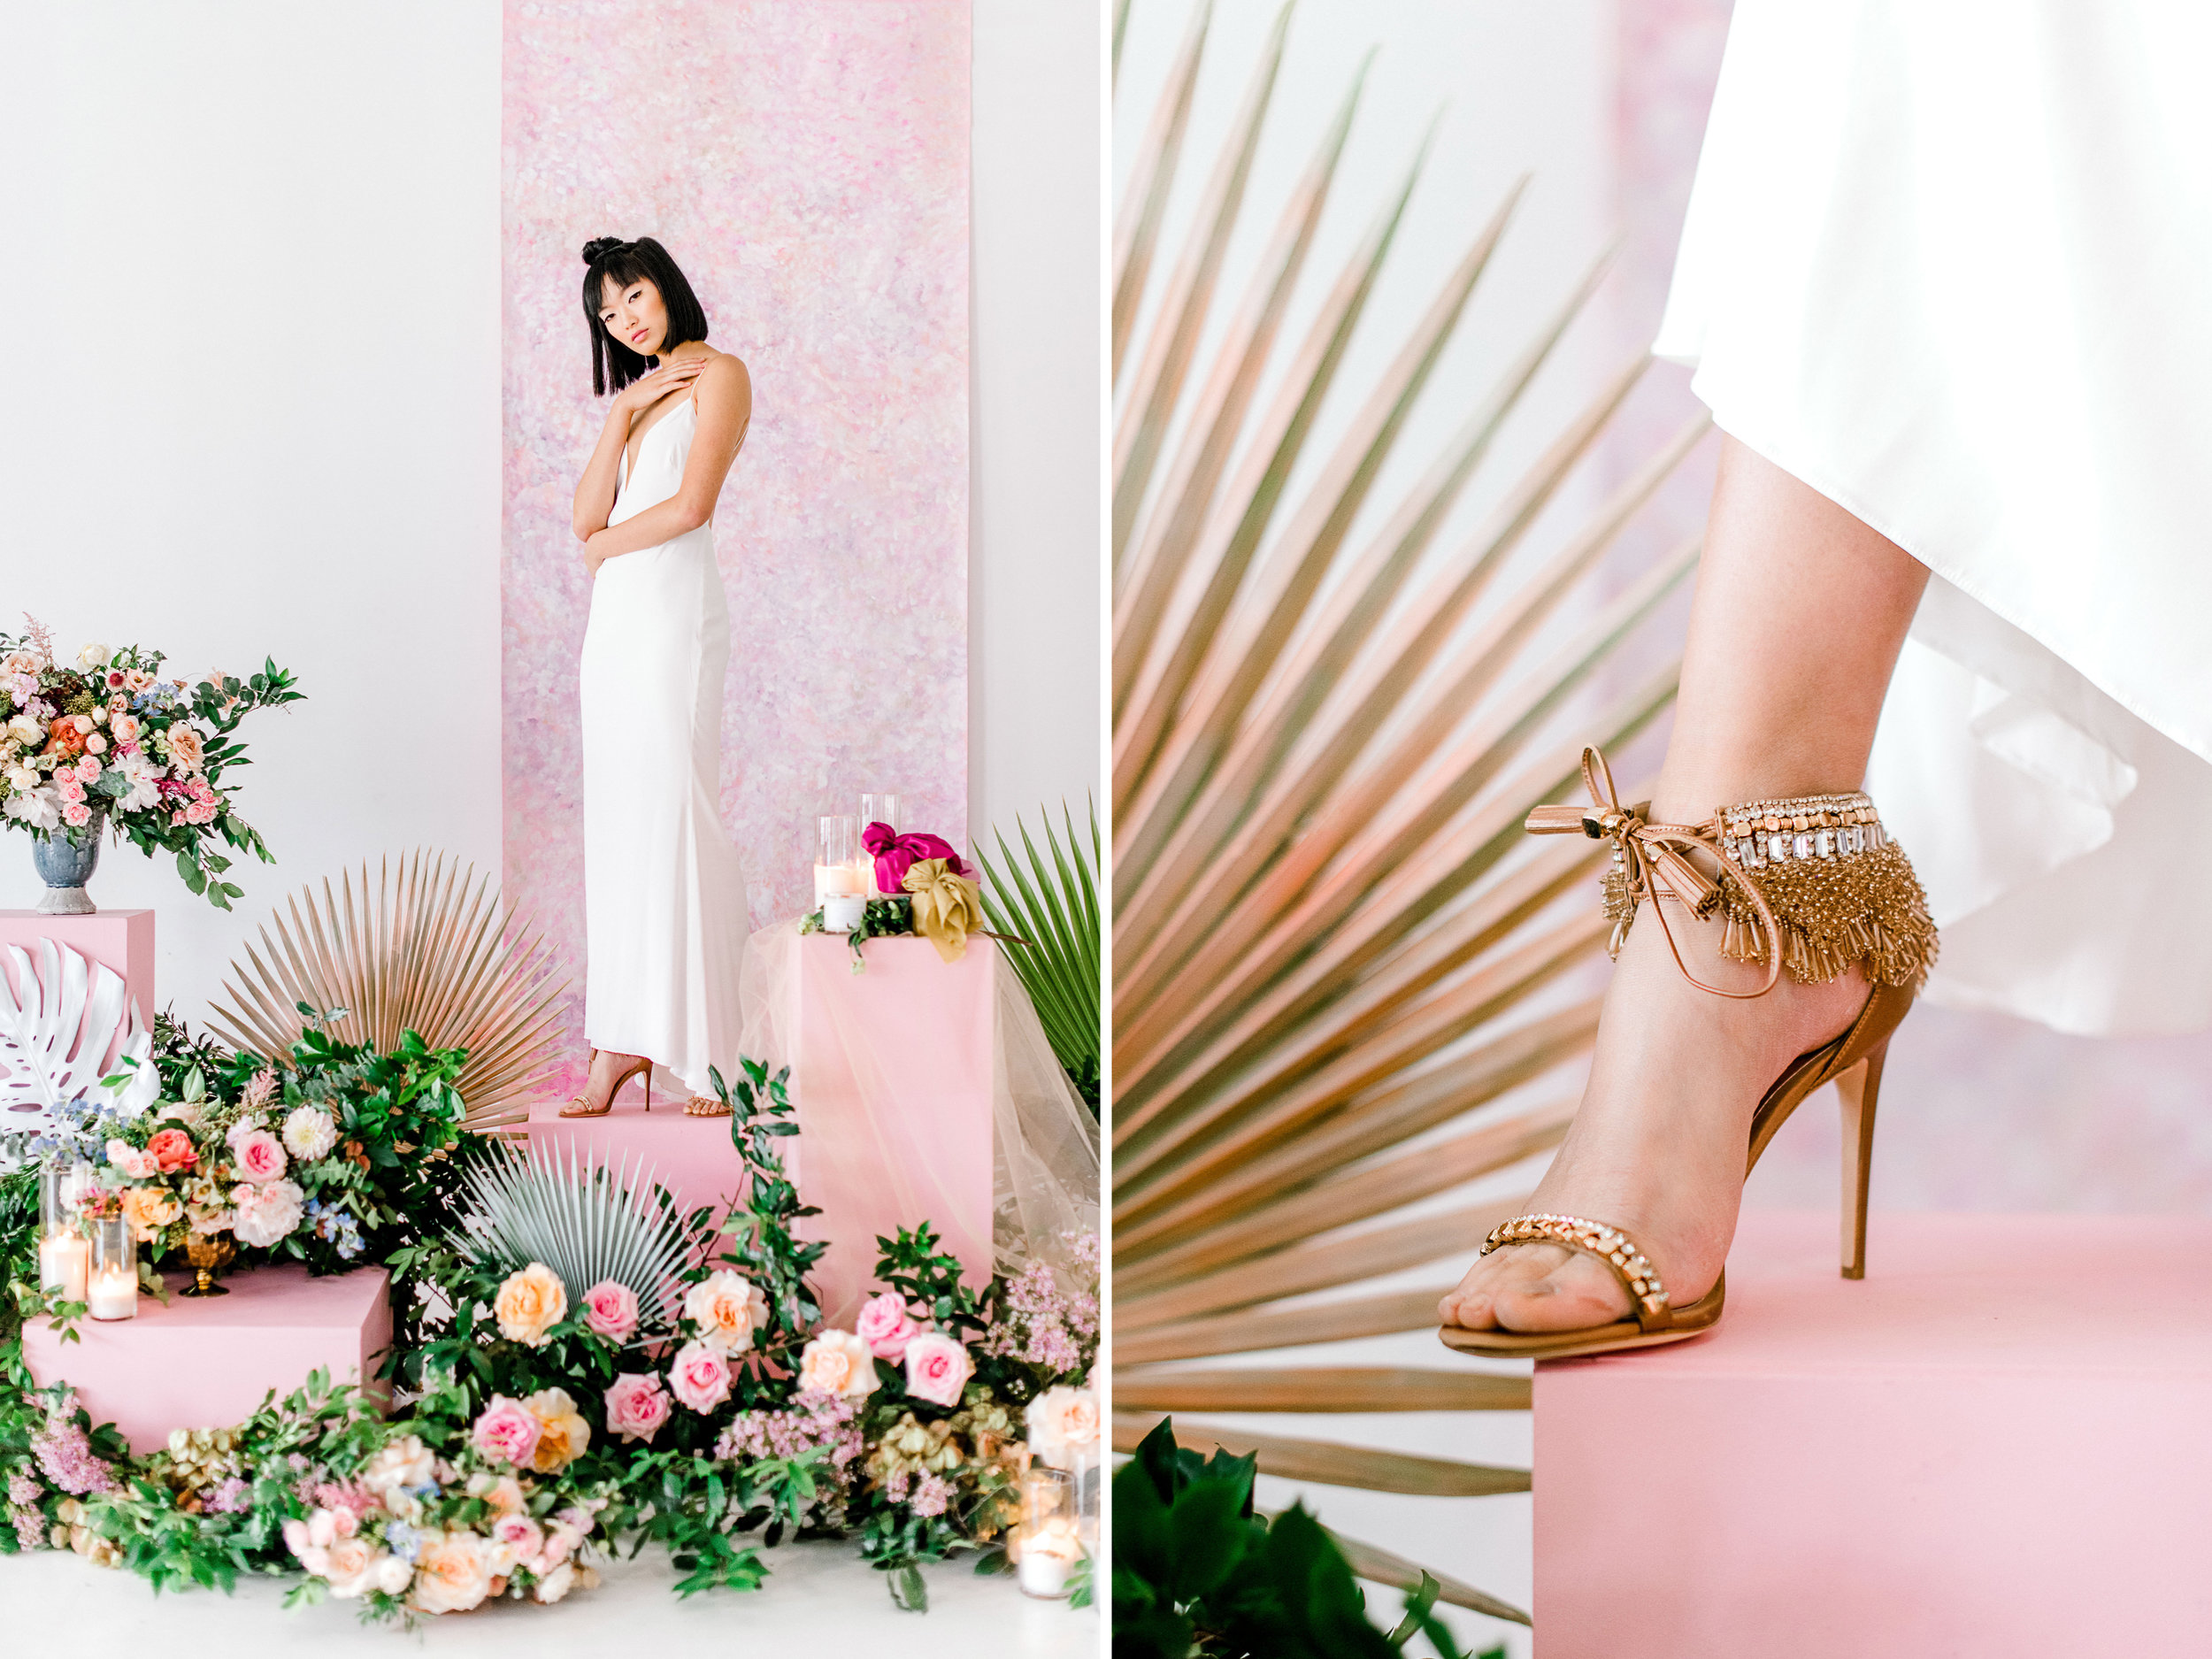 Houston-Wedding-Photographer-Editorial-Fine-Art-Film-Destination-Dallas-Texas-Mibellarosa-Josh-Dana-Fernandez-Photography-101.jpg